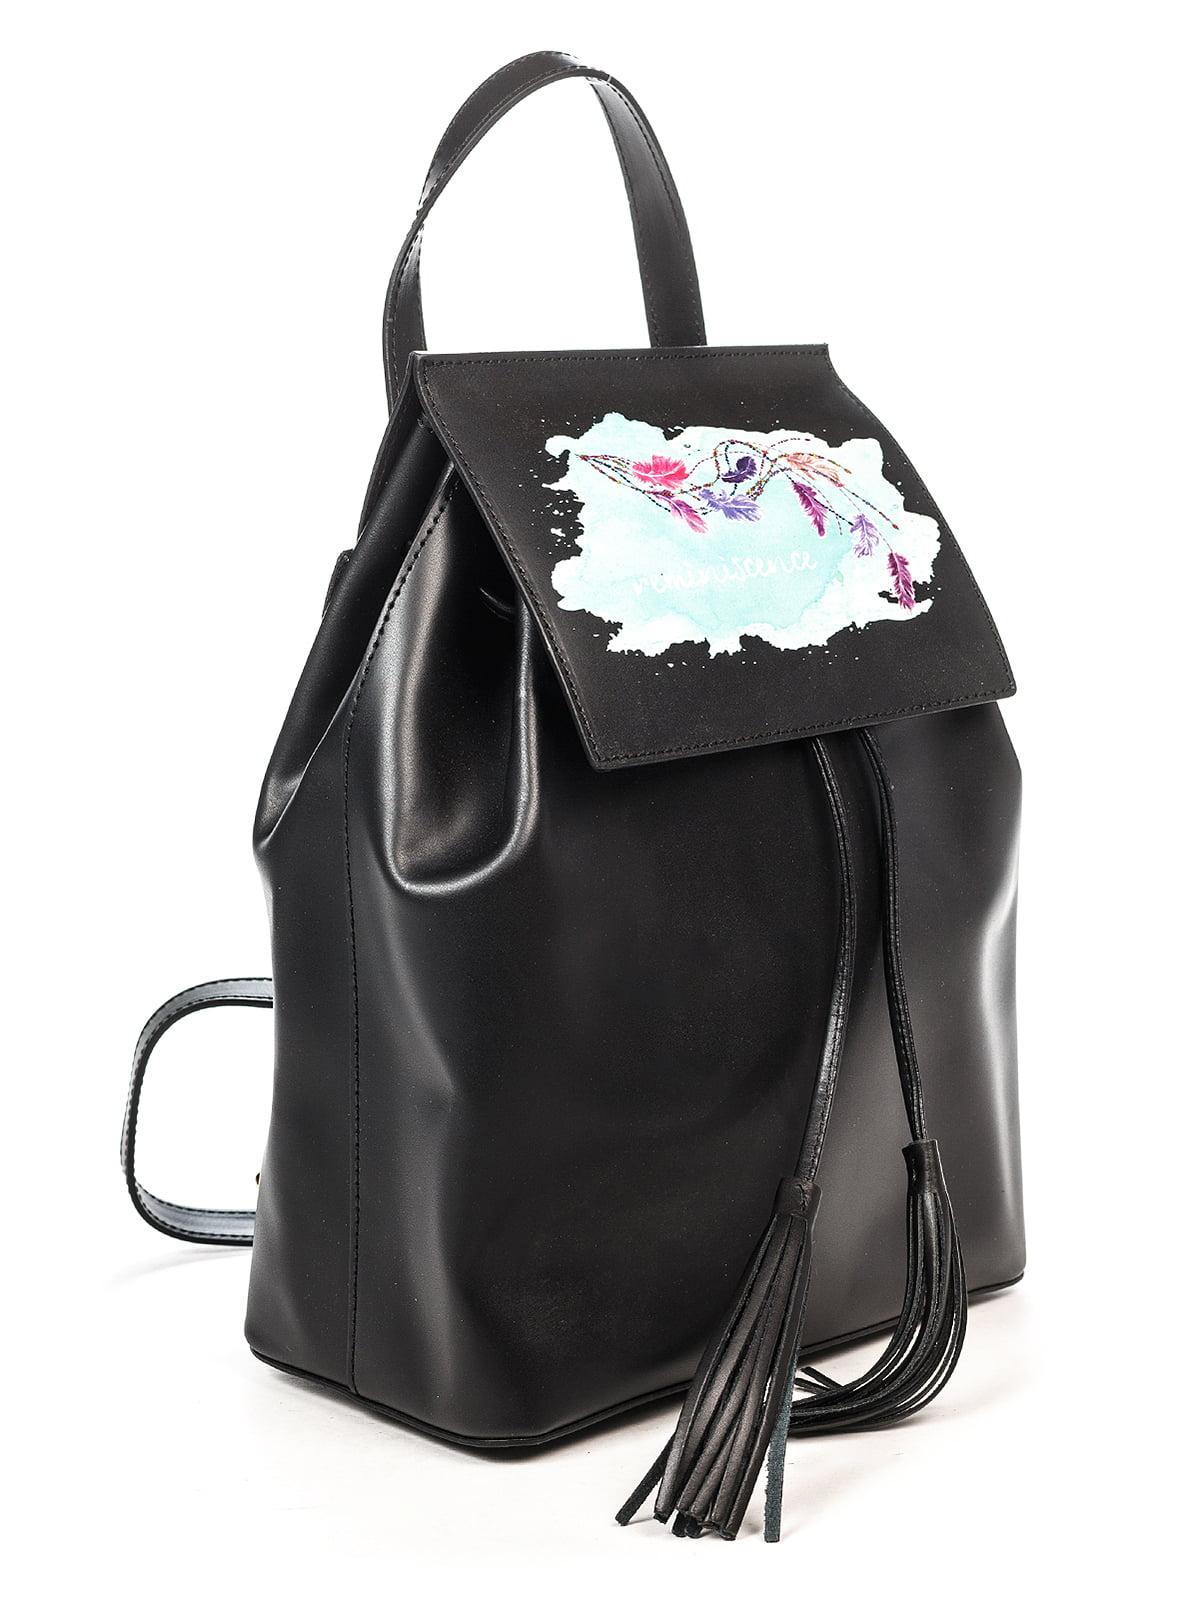 Рюкзак чорний | 4979547 | фото 3